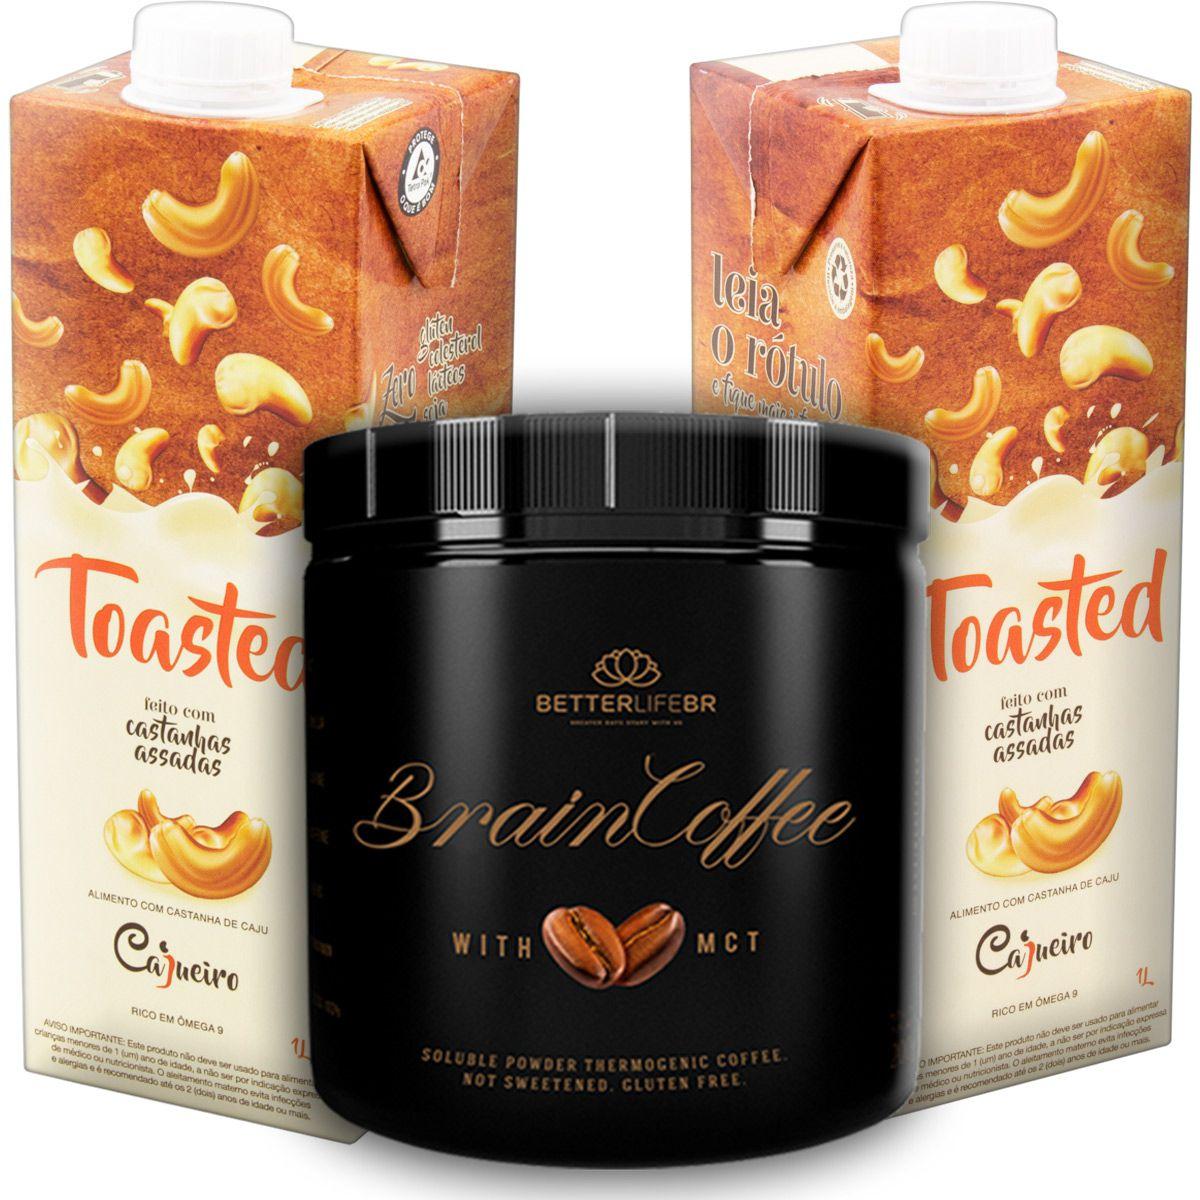 1 Brain Coffee com MCT 200g e 2 Leite Vegetal Toasted 1lt